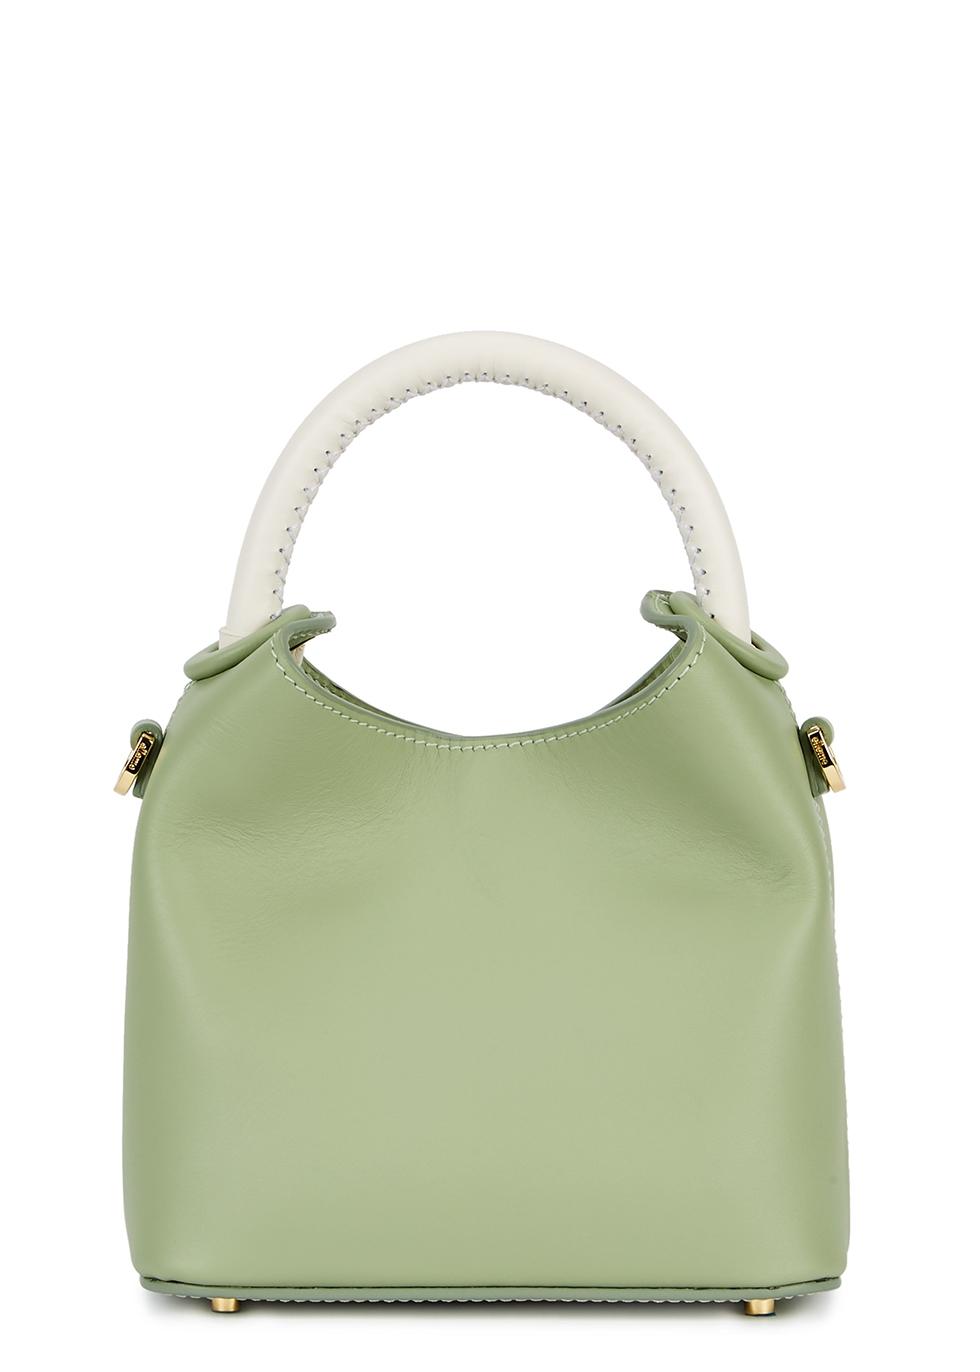 ELLEME Madeleine Mini Leather Cross-Body Bag in Green